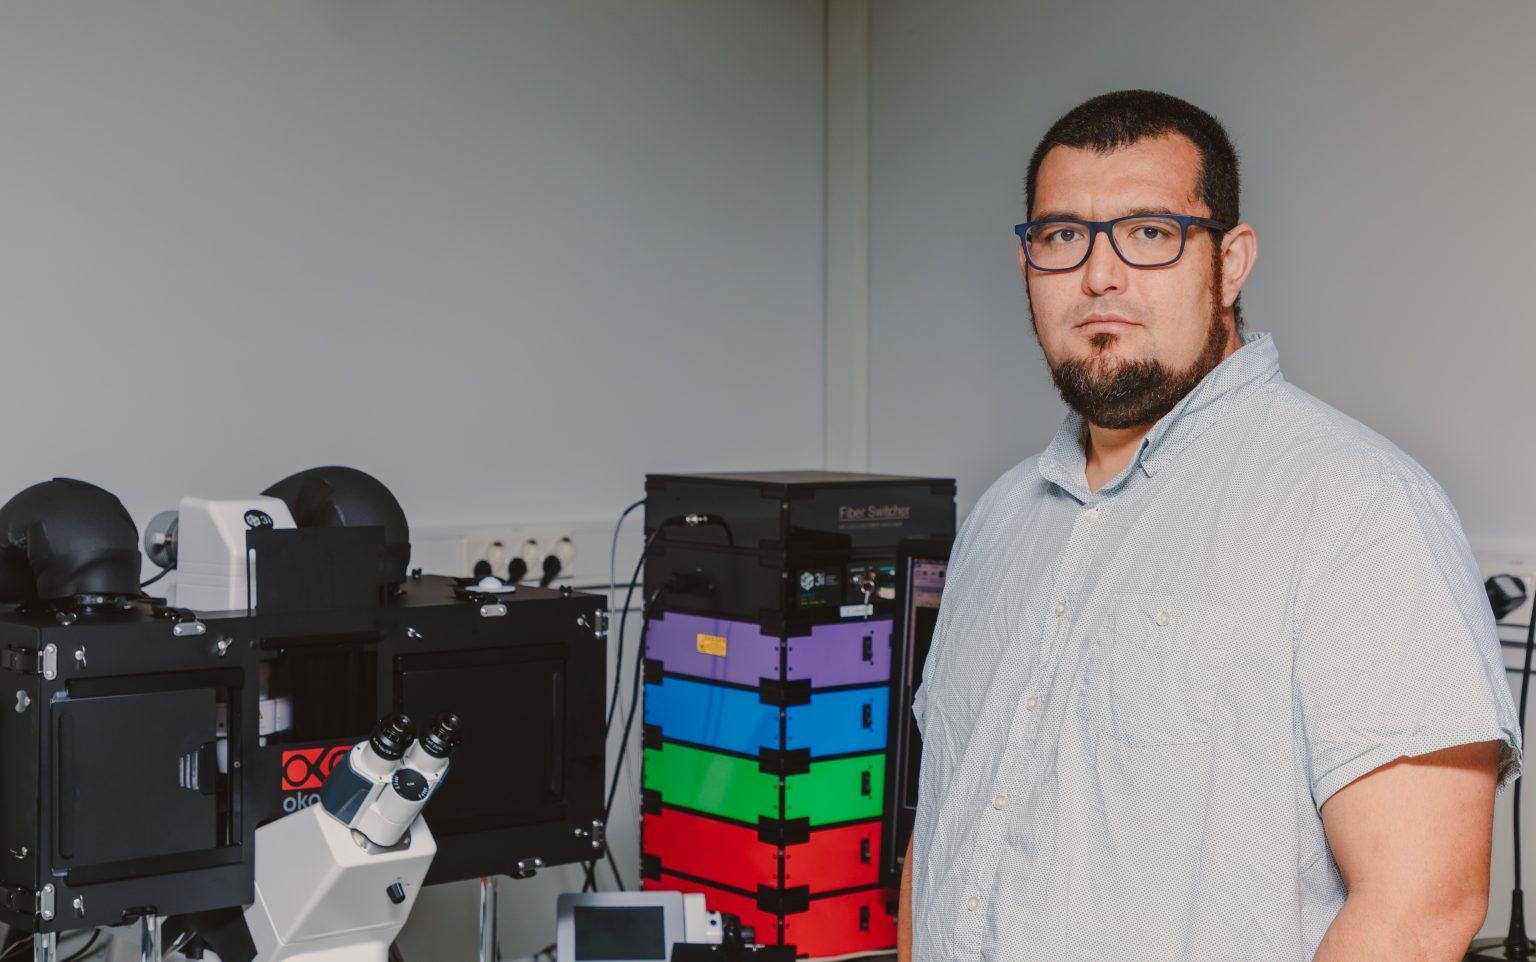 Atomic Force Microscopy: Describing the mechanical properties of diverse materials